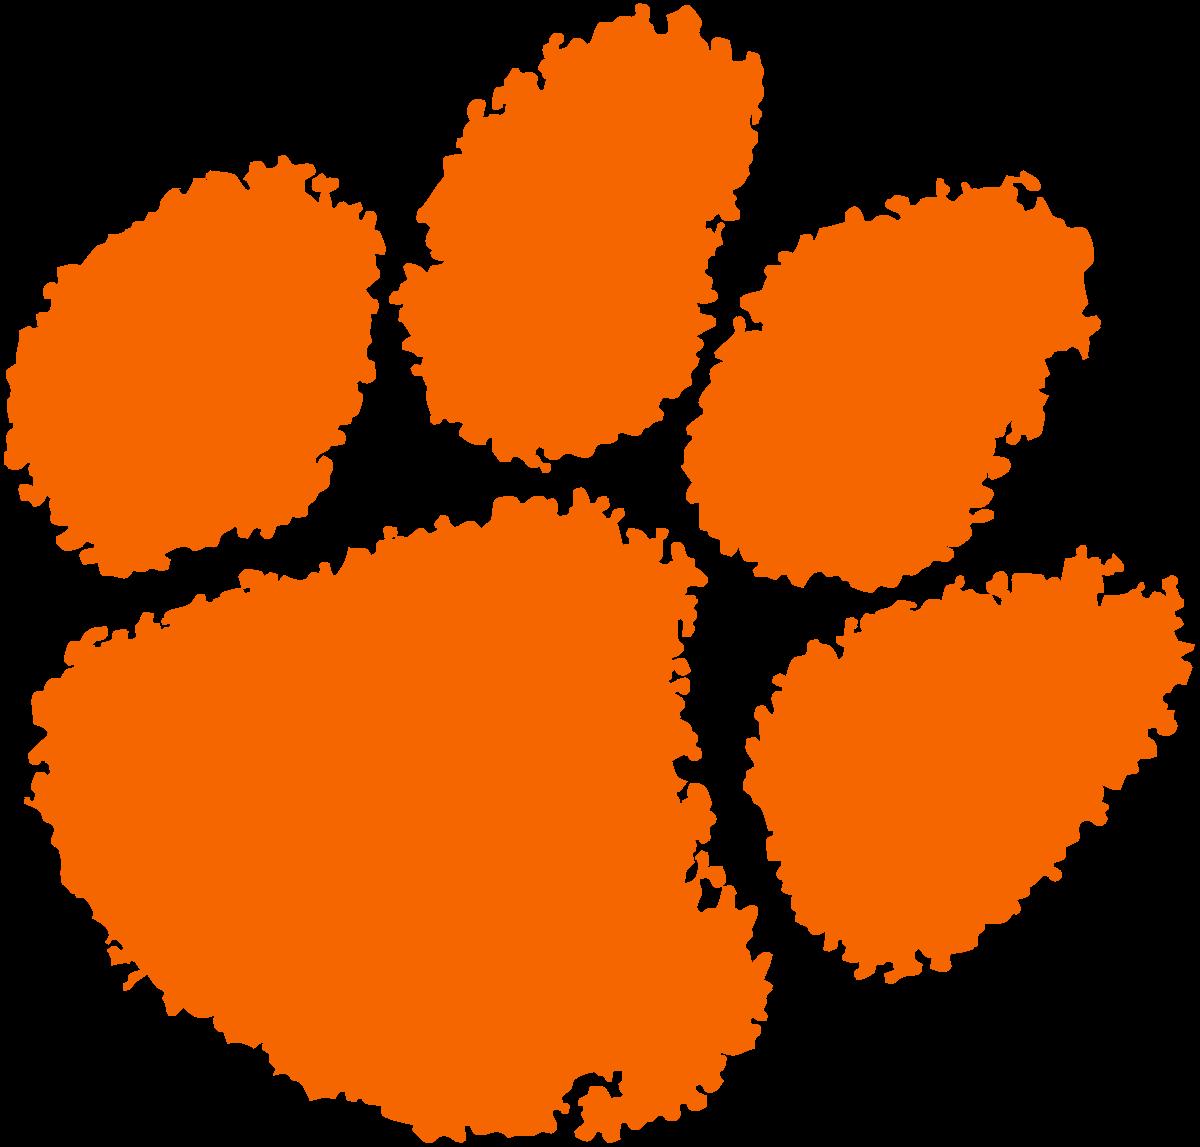 1200px-Clemson_Tigers_logo.png